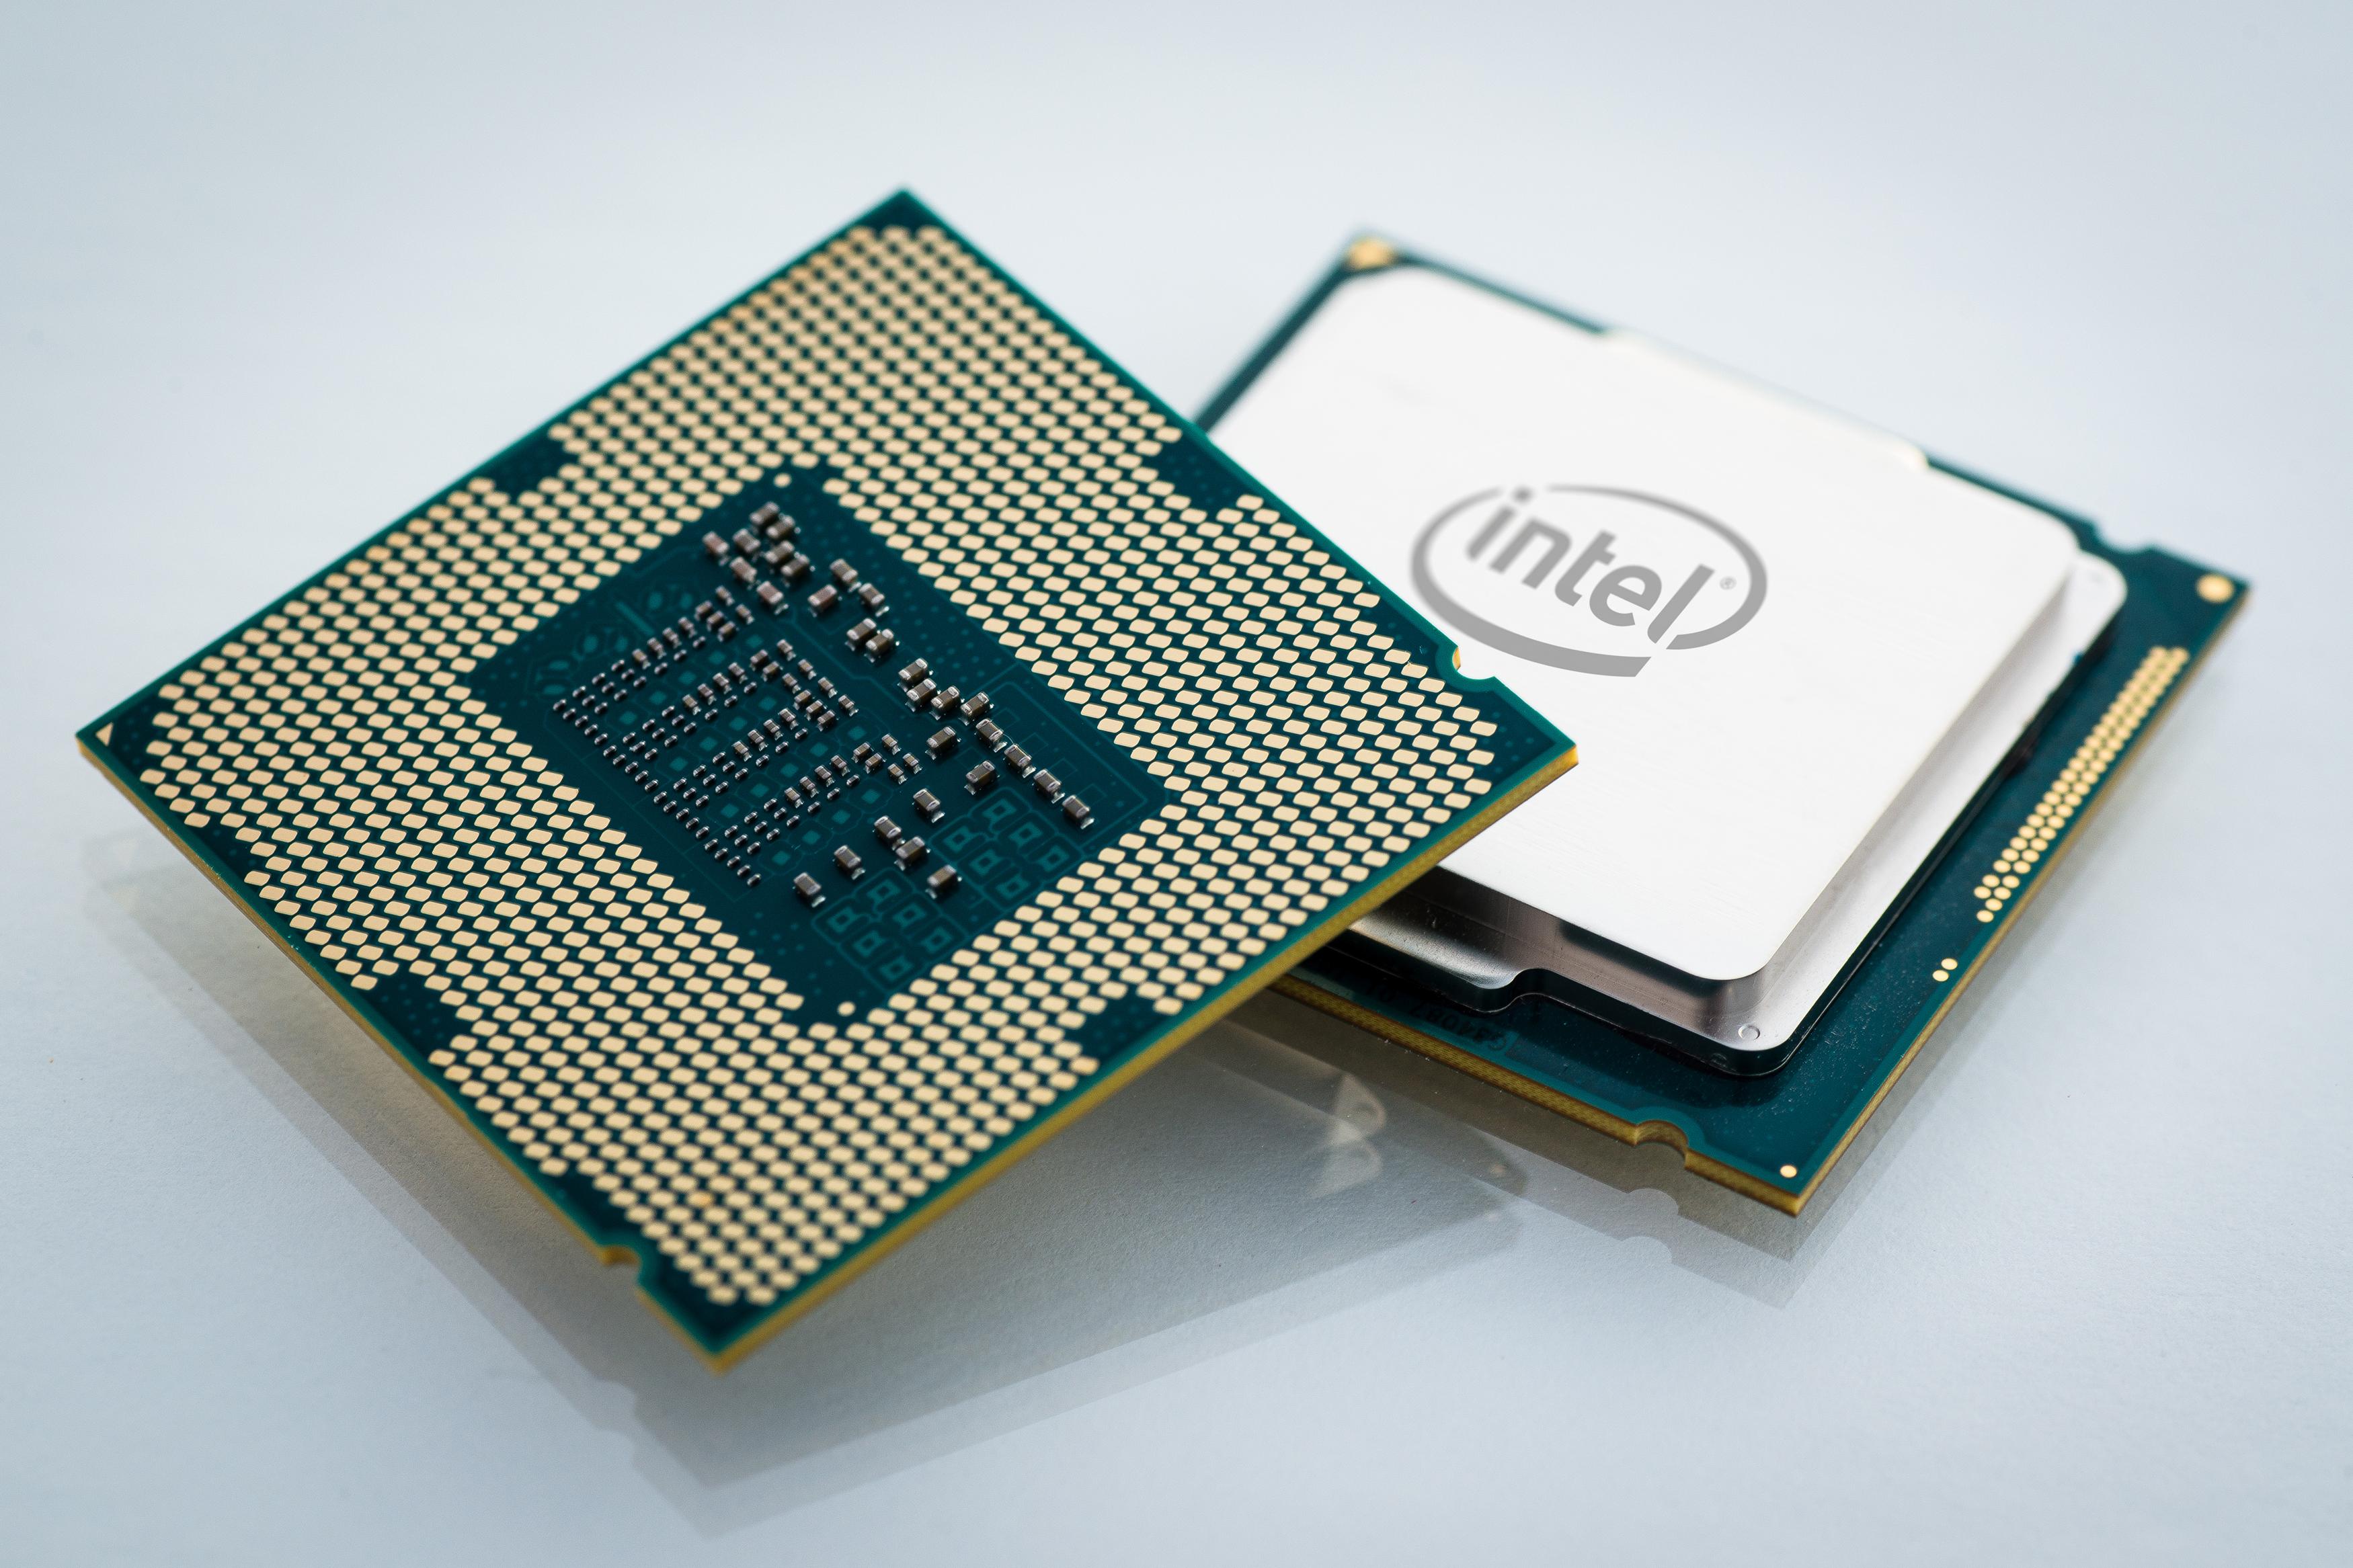 Intel Core i7-4790K, Core i5-4690K and Pentium G3258